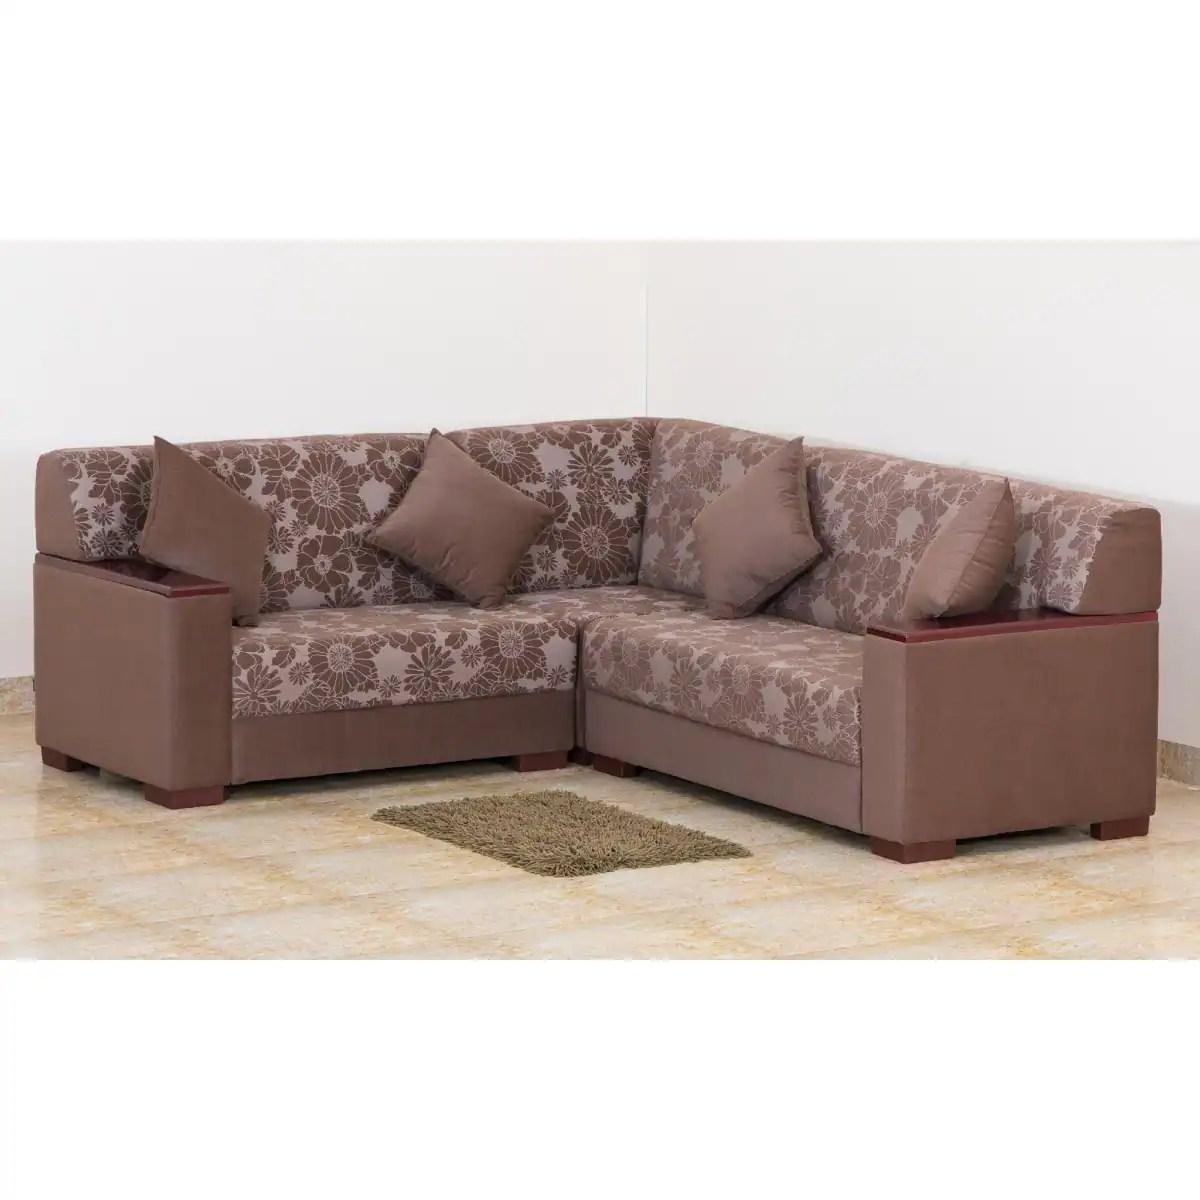 arpico sofa sets sri lanka bb italia bed l free shipping clic american design genuine leather